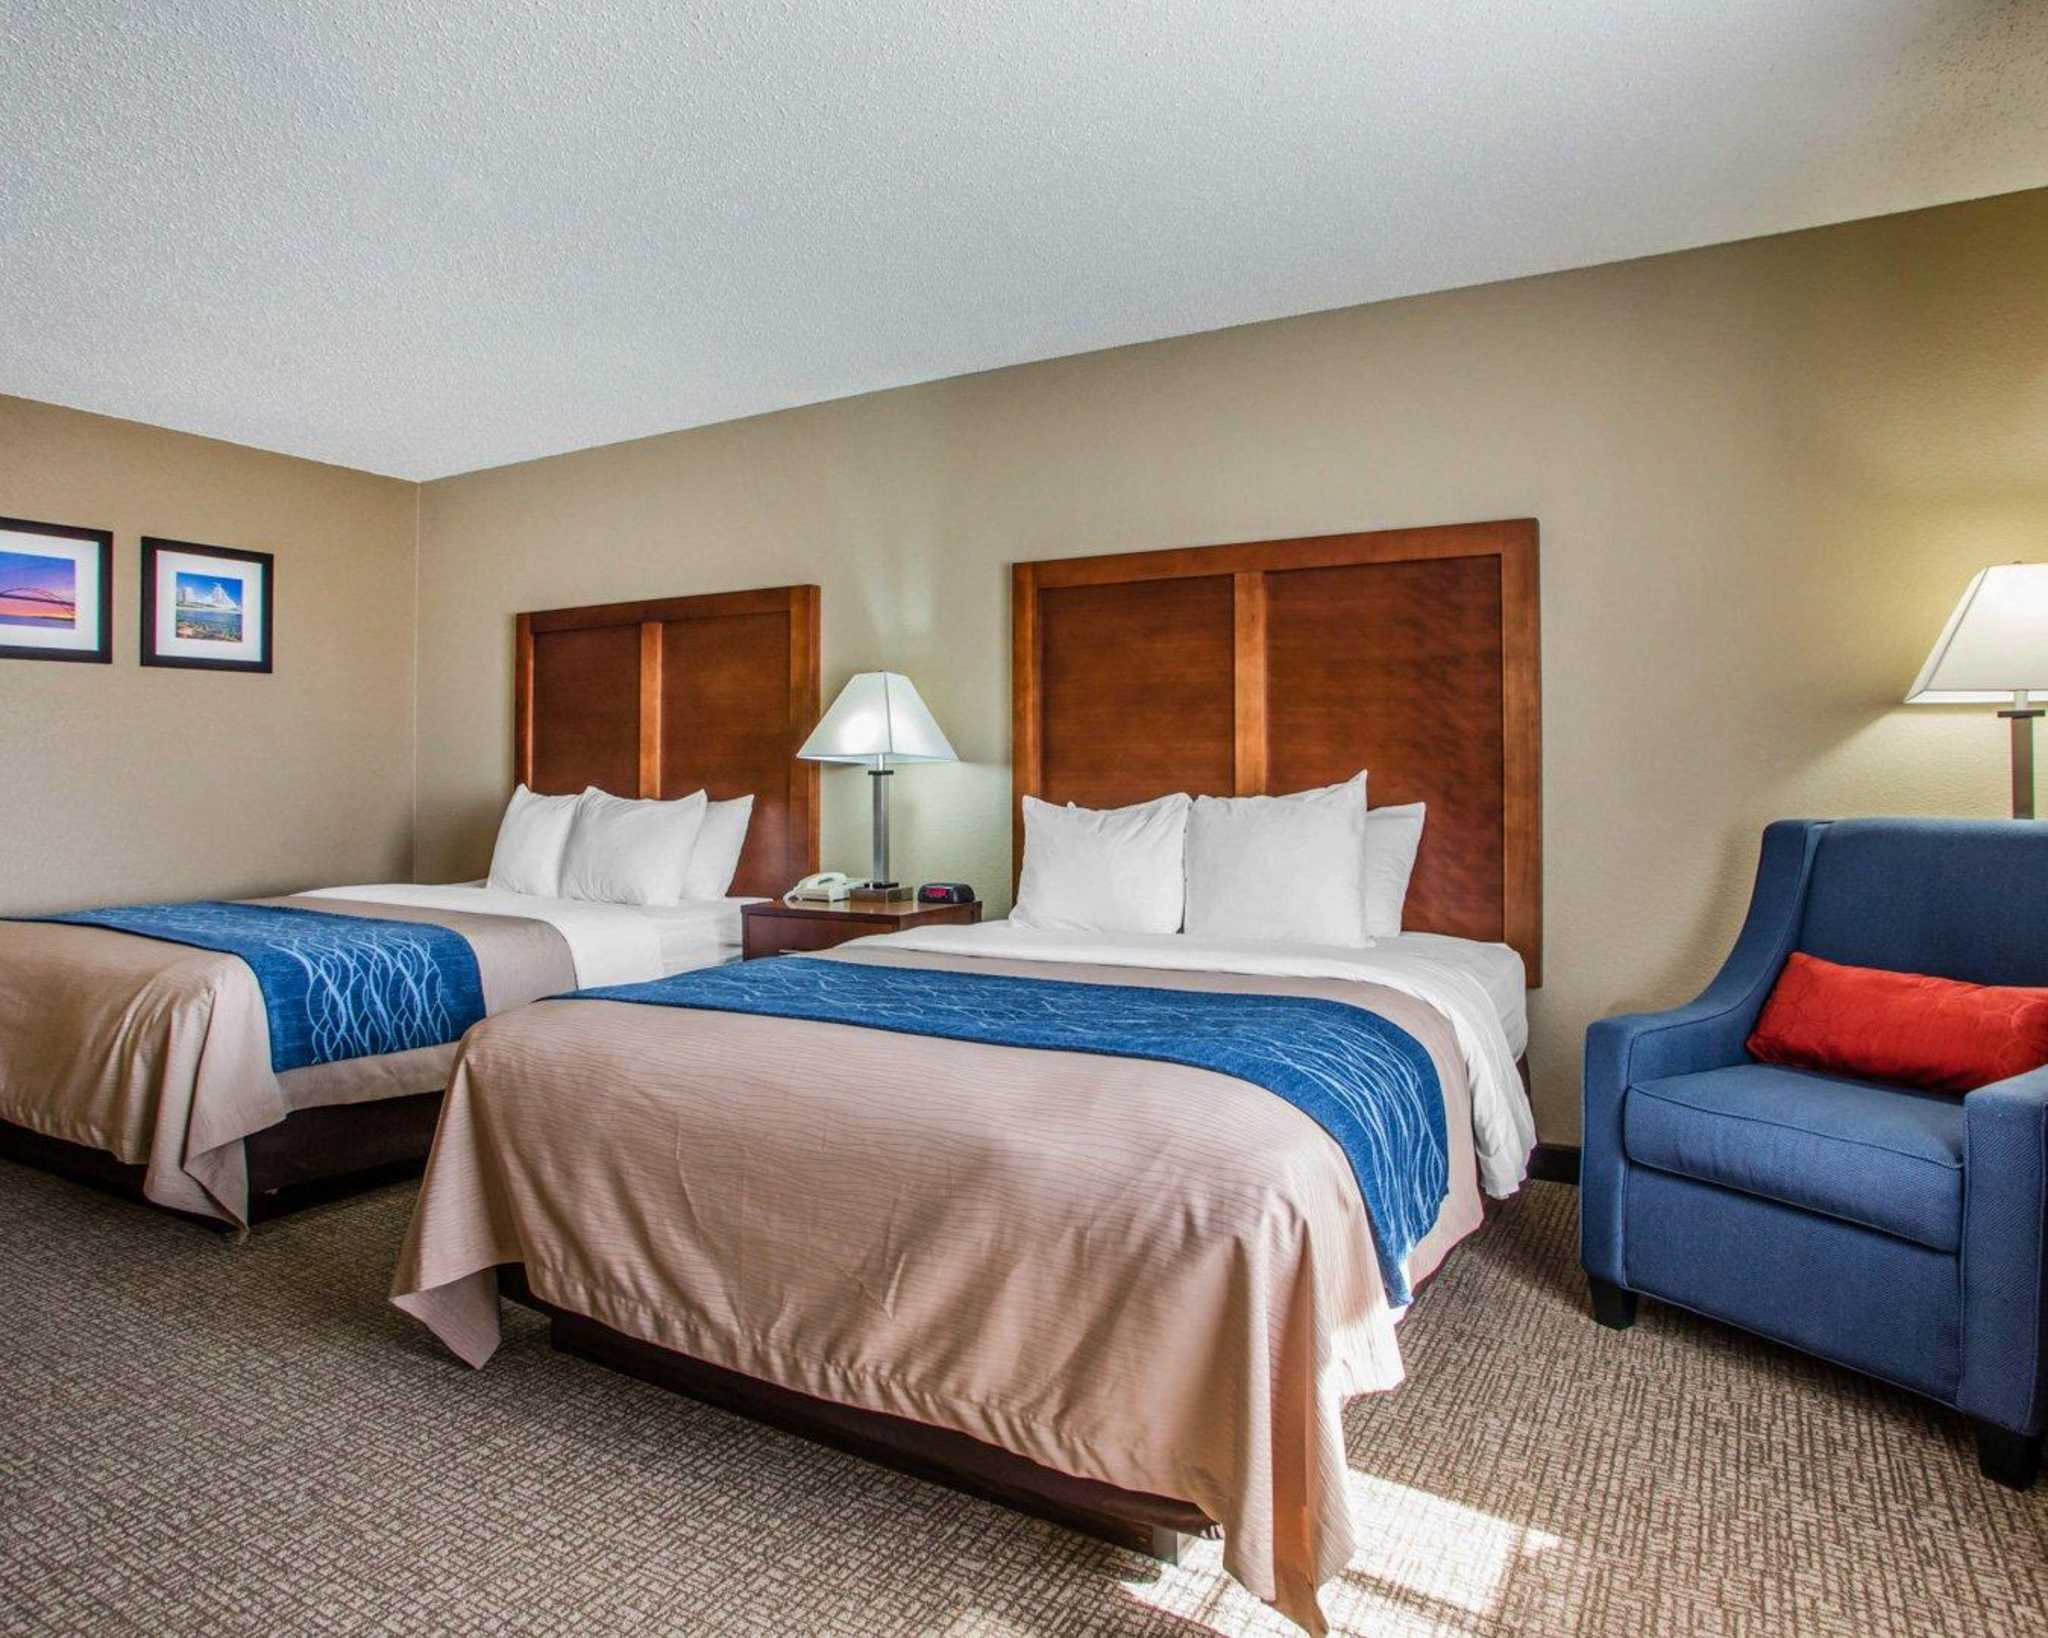 Comfort Inn & Suites Jackson - West Bend image 7